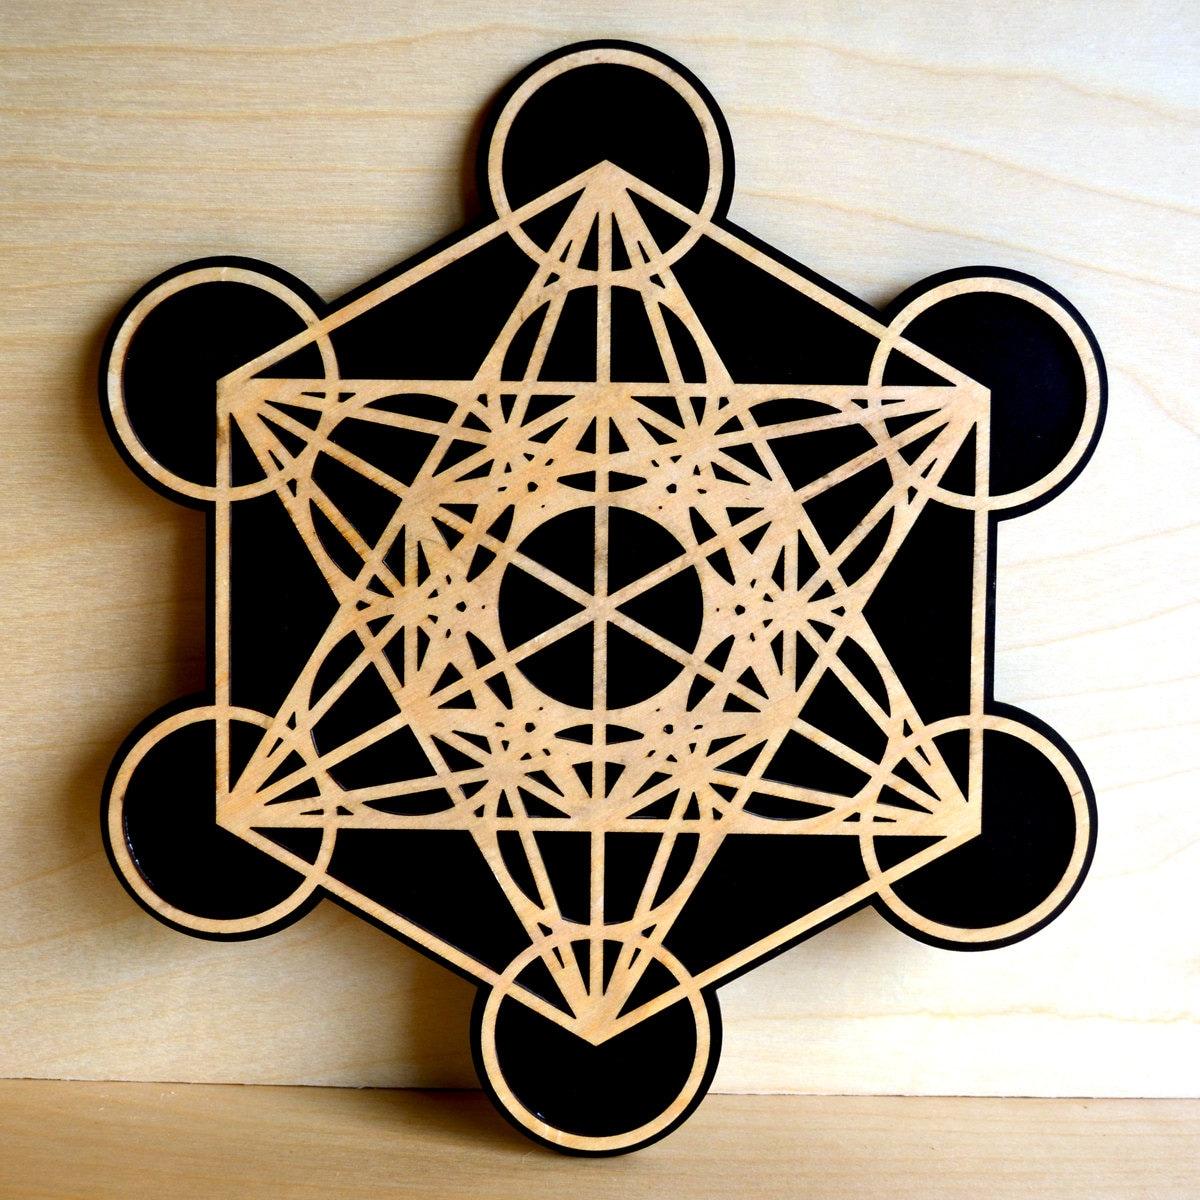 Metatron 39 s cube wall art sacred geometry laser cut art - Cube wall decor ...